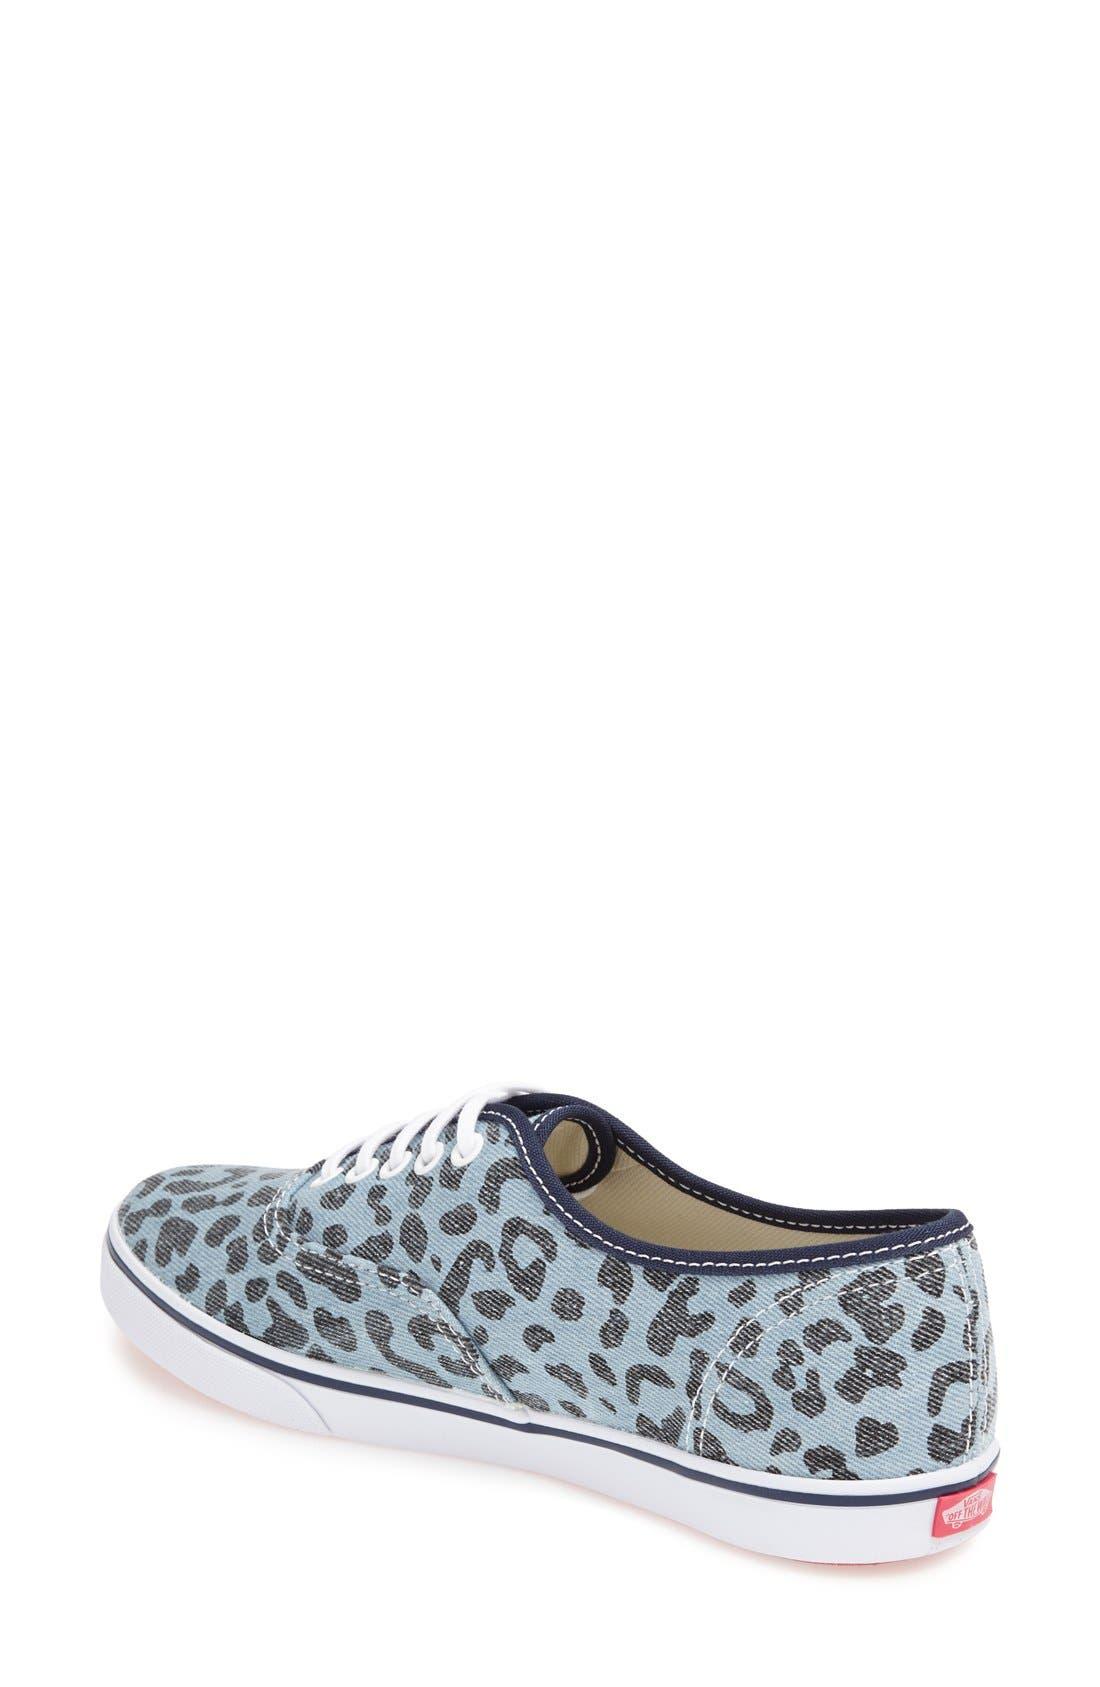 Alternate Image 2  - Vans 'Authentic - Lo Pro' Leopard Print Sneaker (Women)